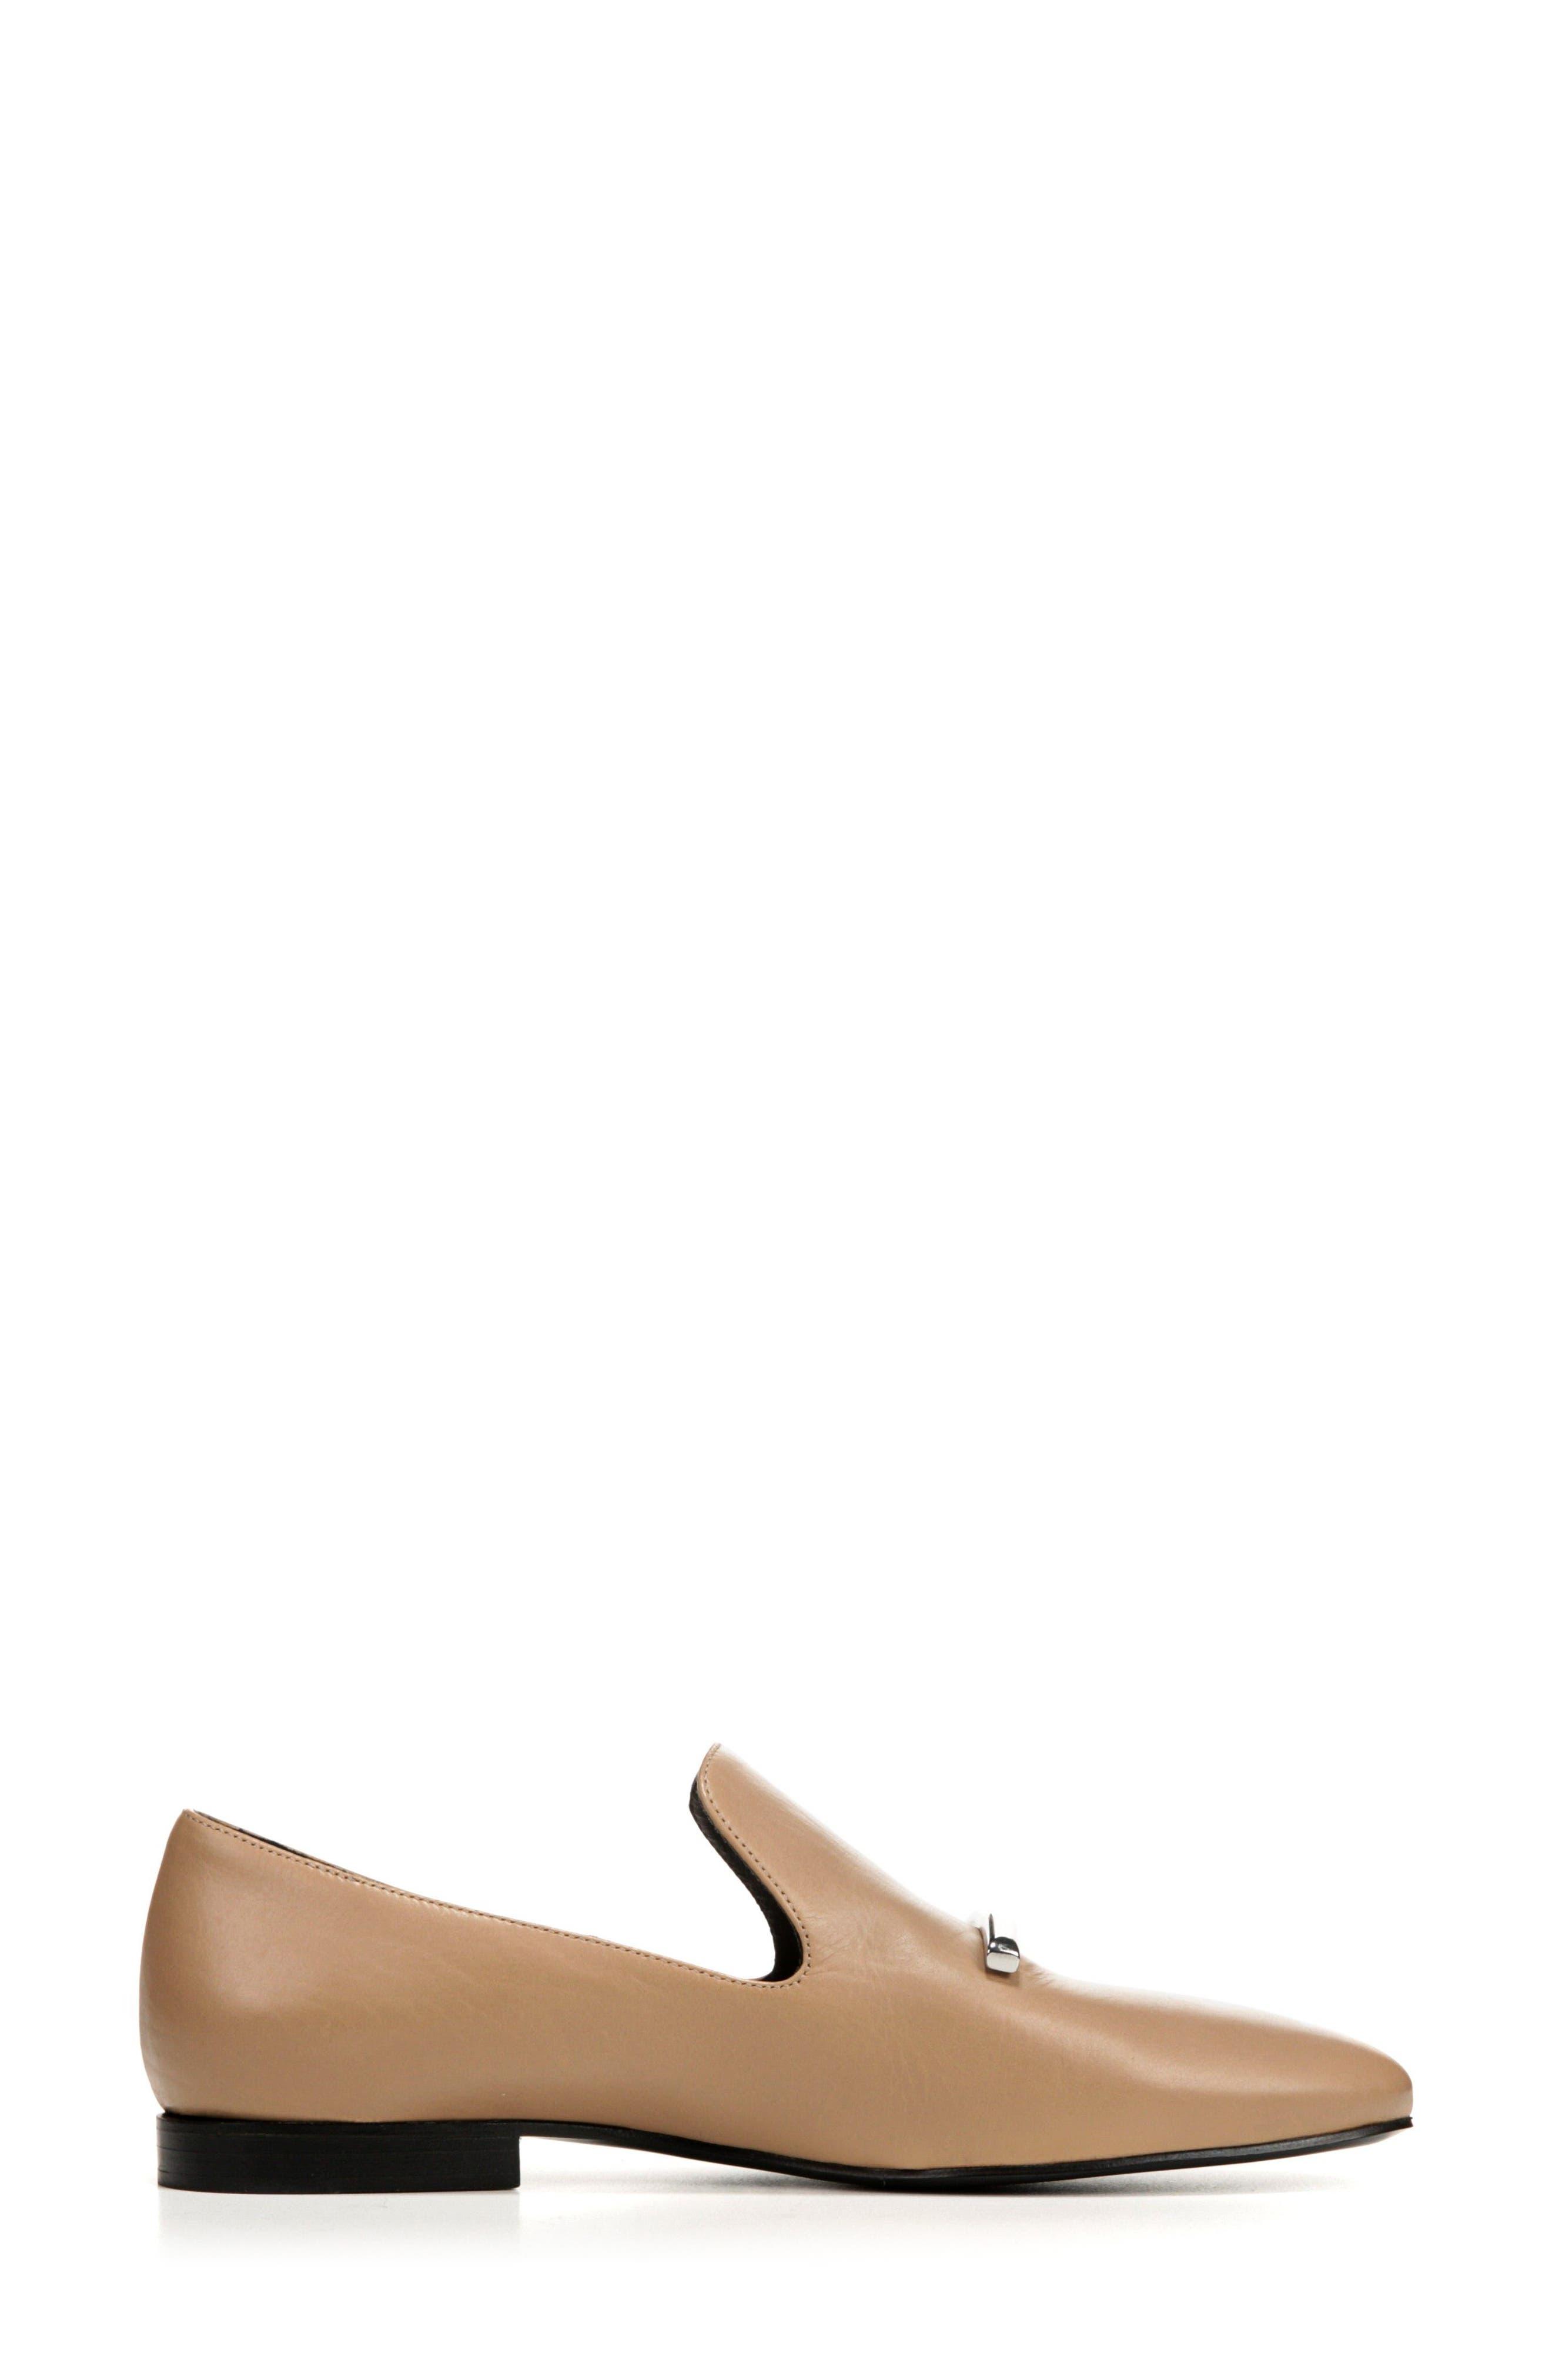 VIA SPIGA, Tallis Flat Loafer, Alternate thumbnail 3, color, 250